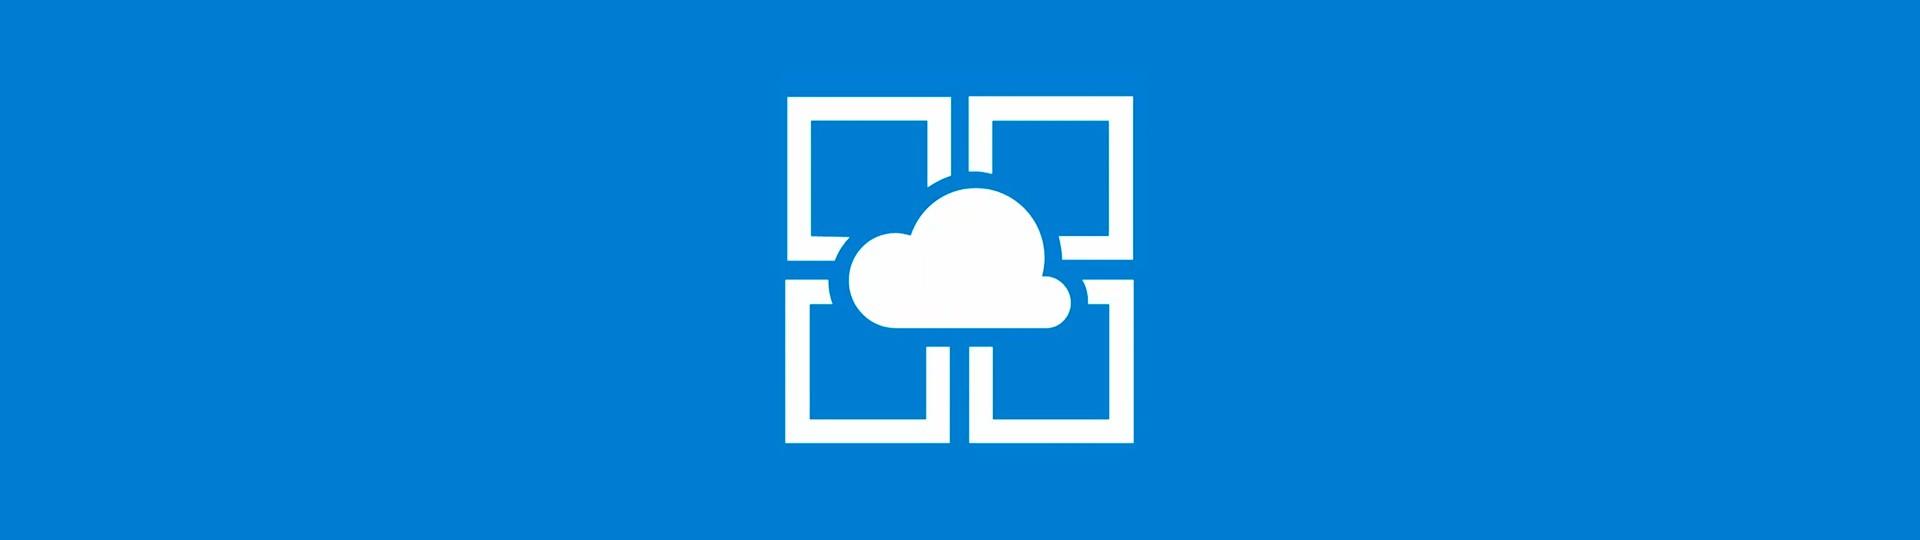 Azure App Services acaba de solucionar dos serias vulnerabilidades